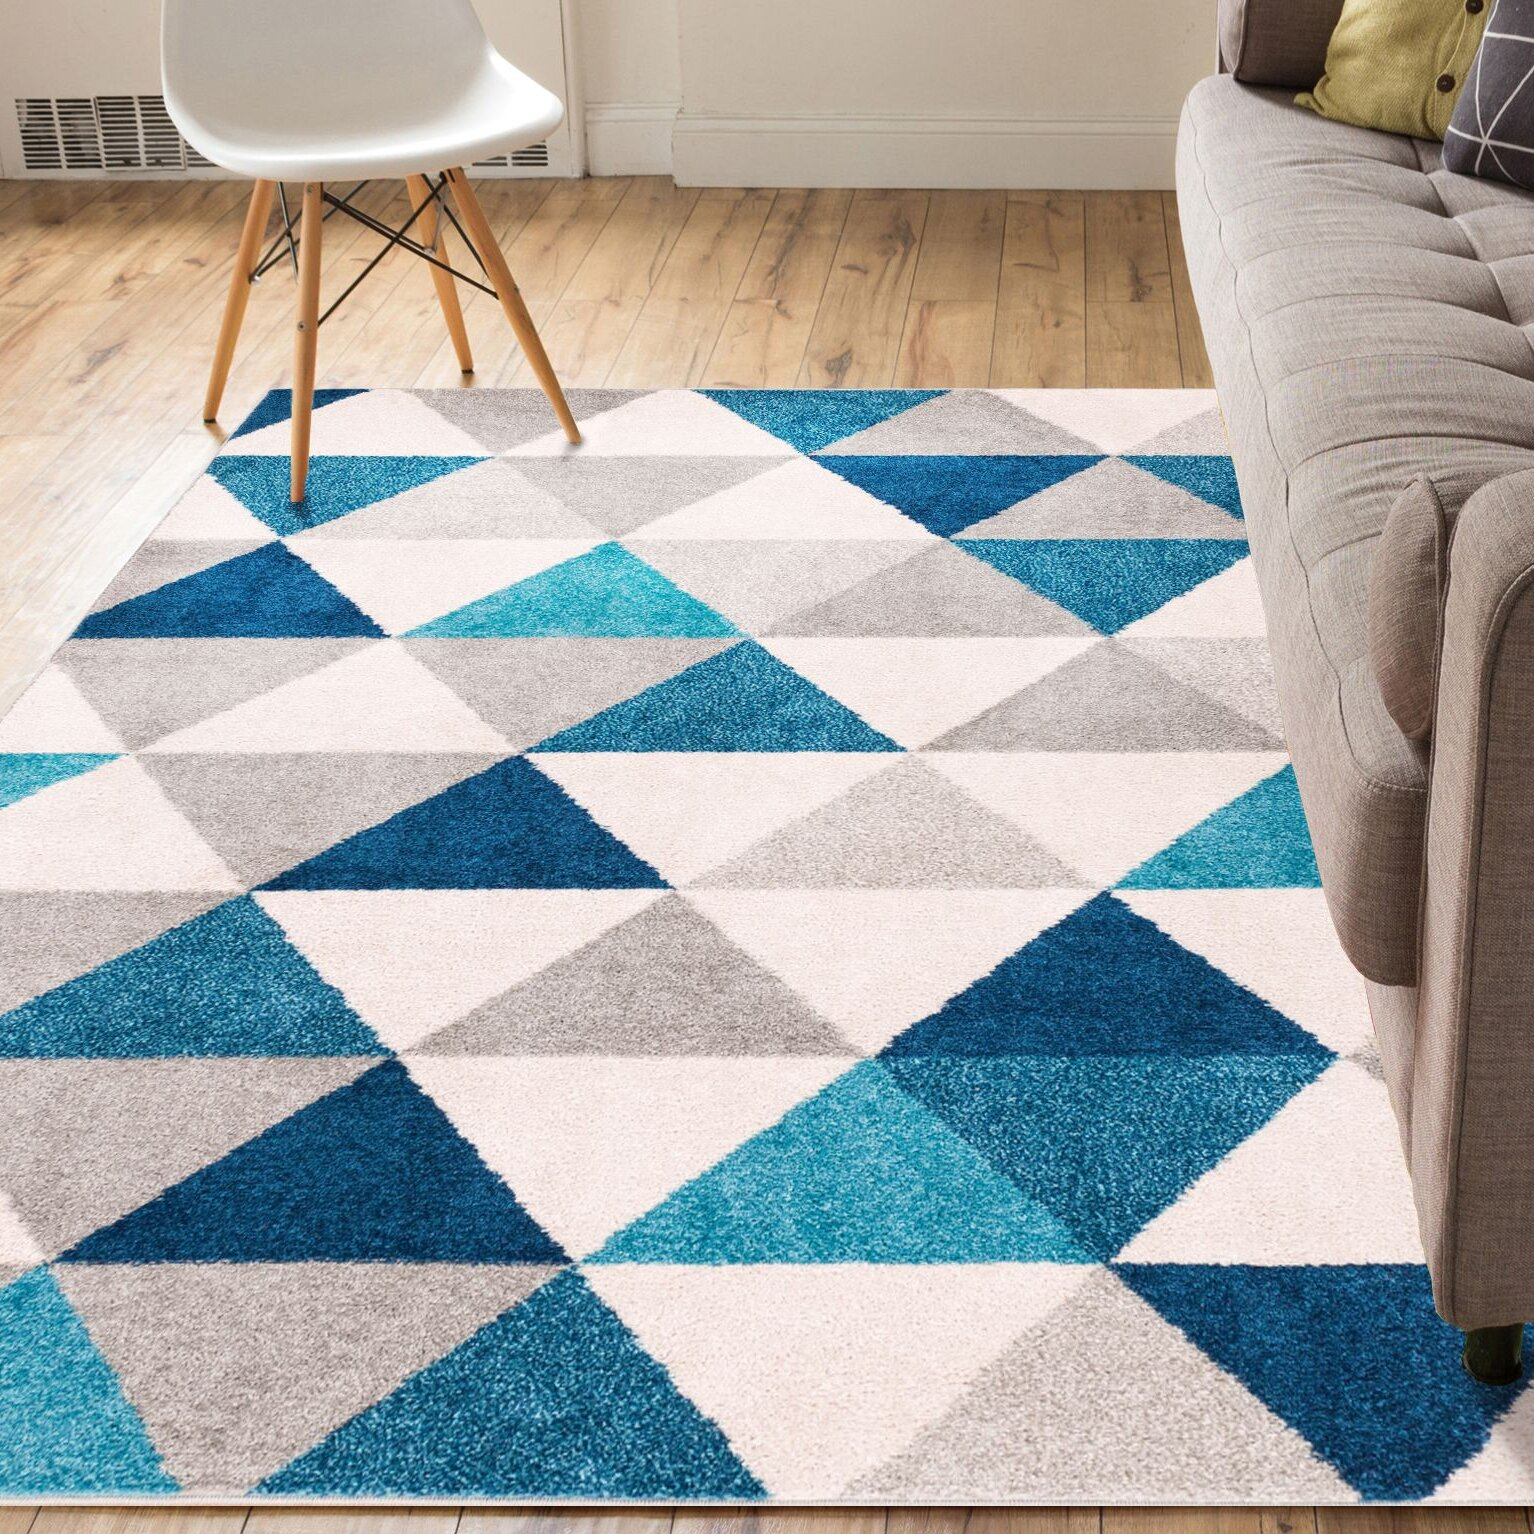 rug manne mykonos rugs ravella blue water liora products area